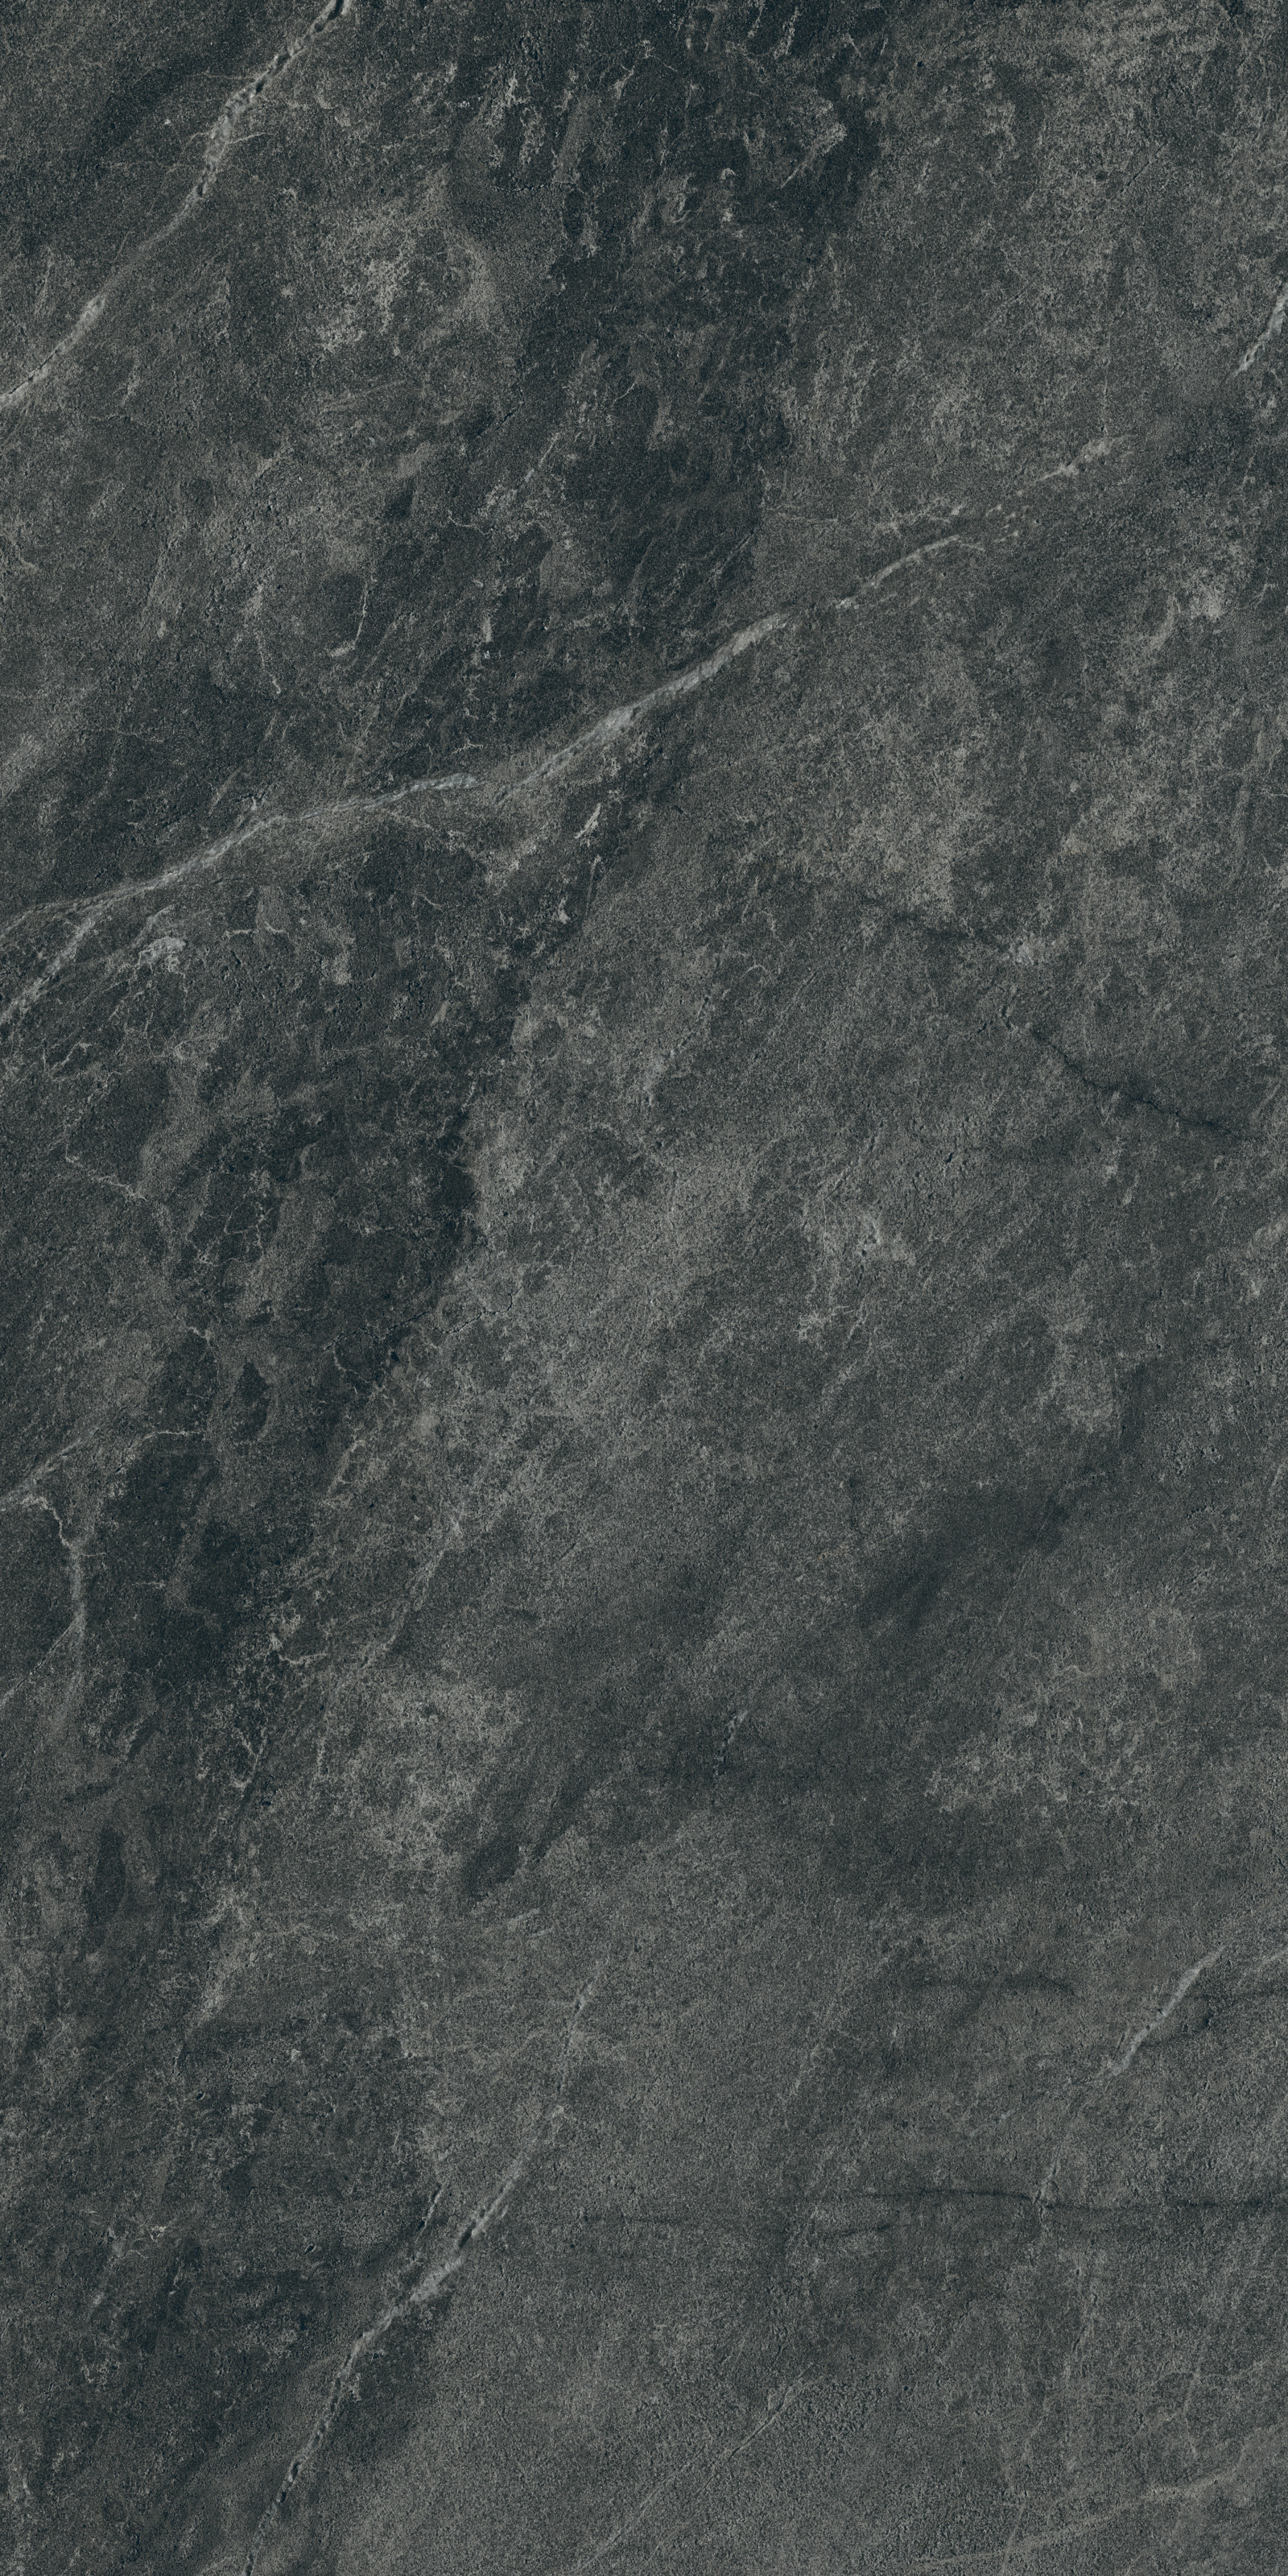 Notte Oscura 1200 x 600 x 20mm (30no = 21.60m2)